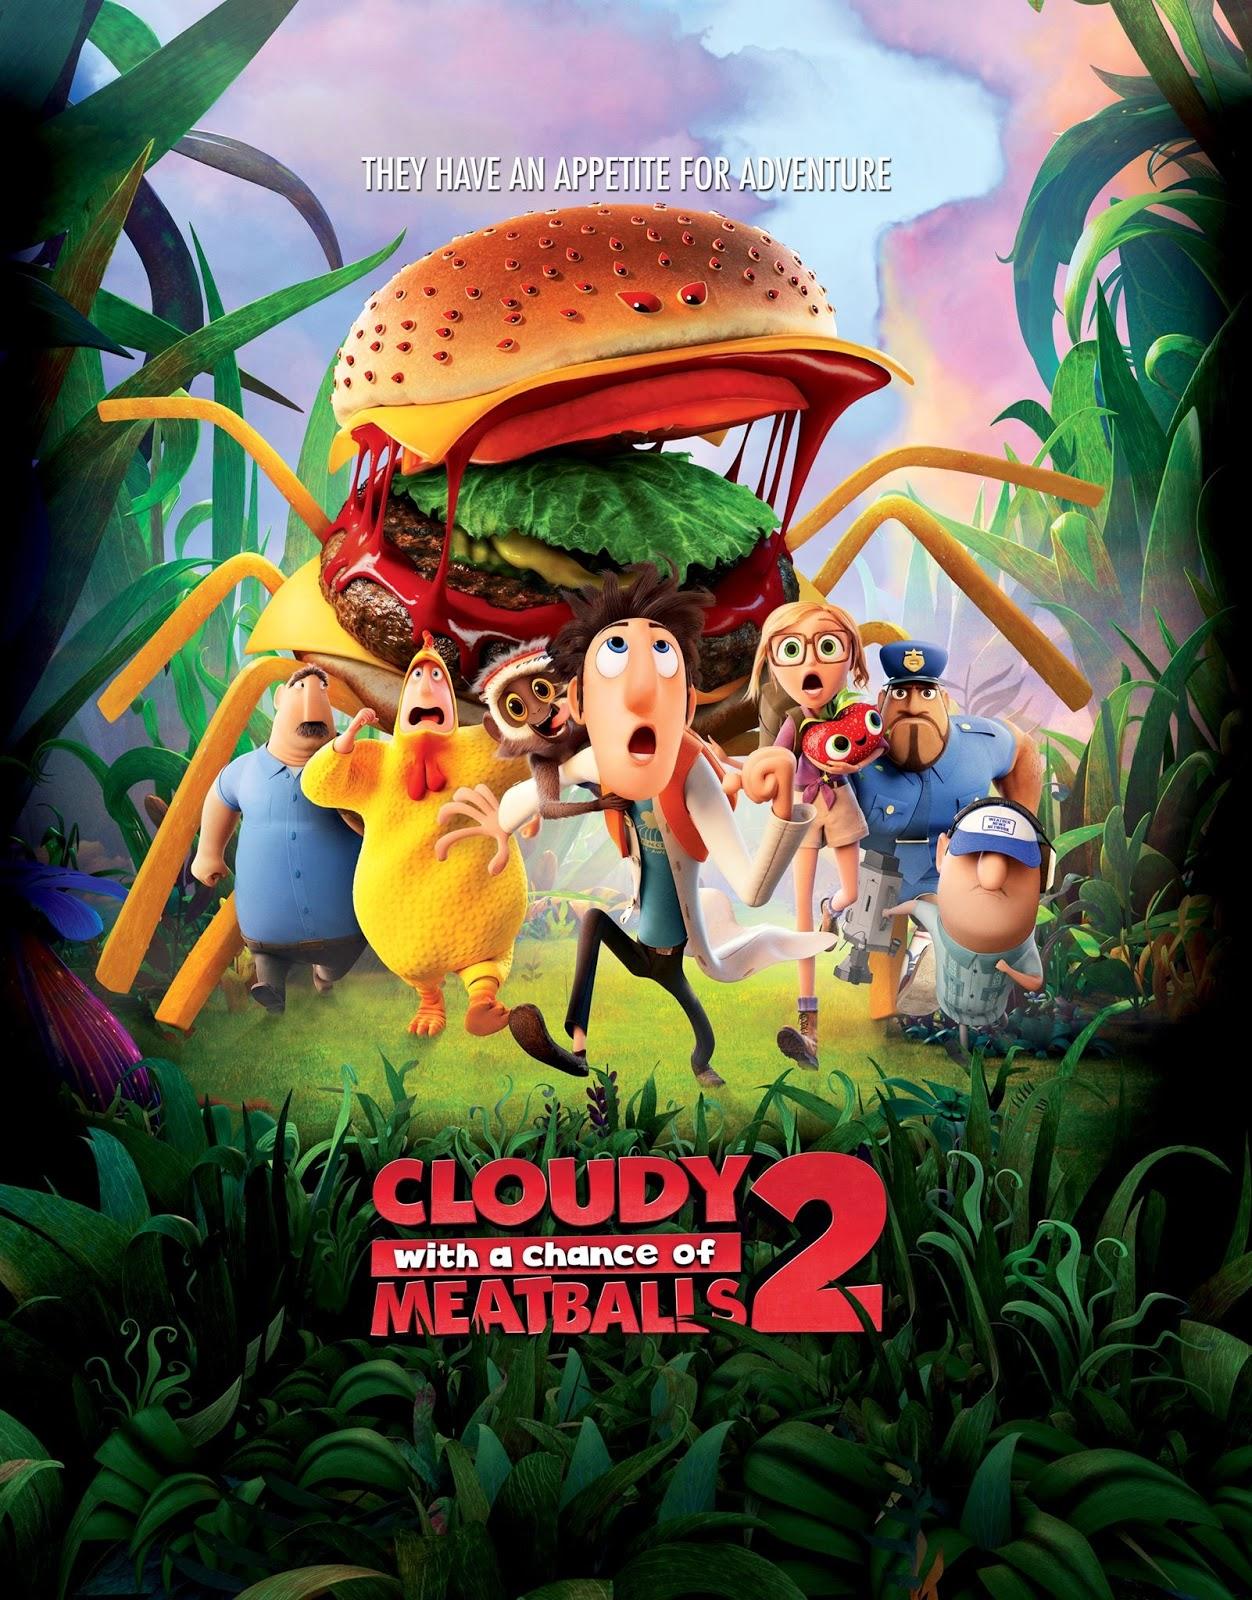 Filme Ta Chovendo Hamburguer Dublado Completo regarding moviemento: tá chovendo hamburguer 2